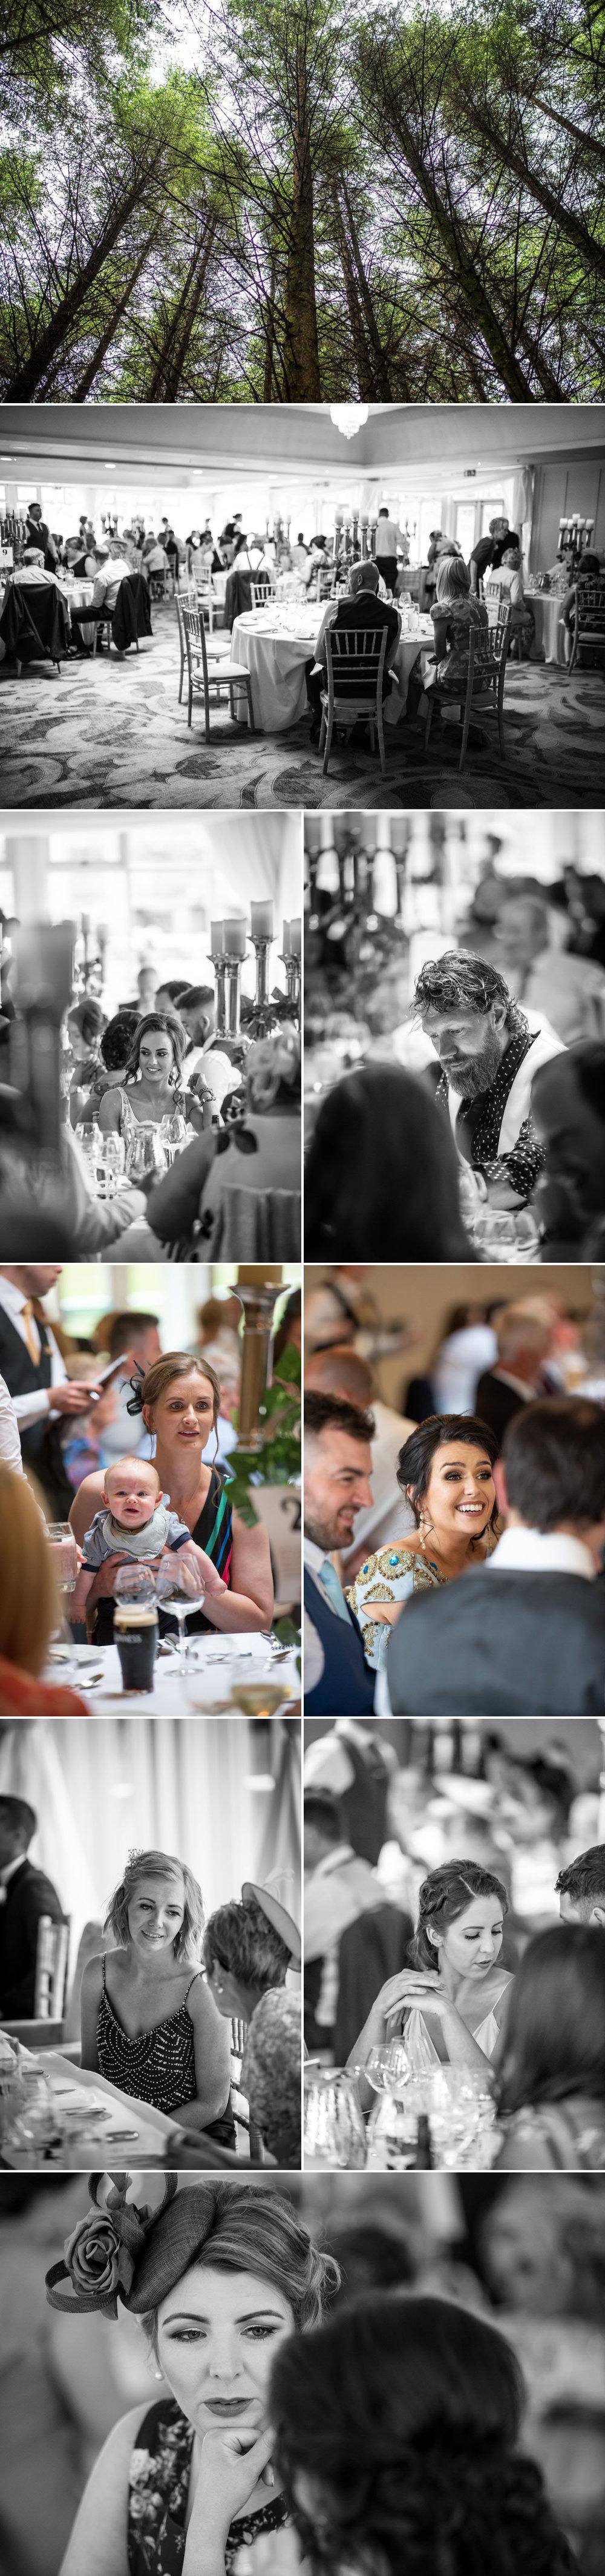 best wedding photographers northern ireland 15.jpg